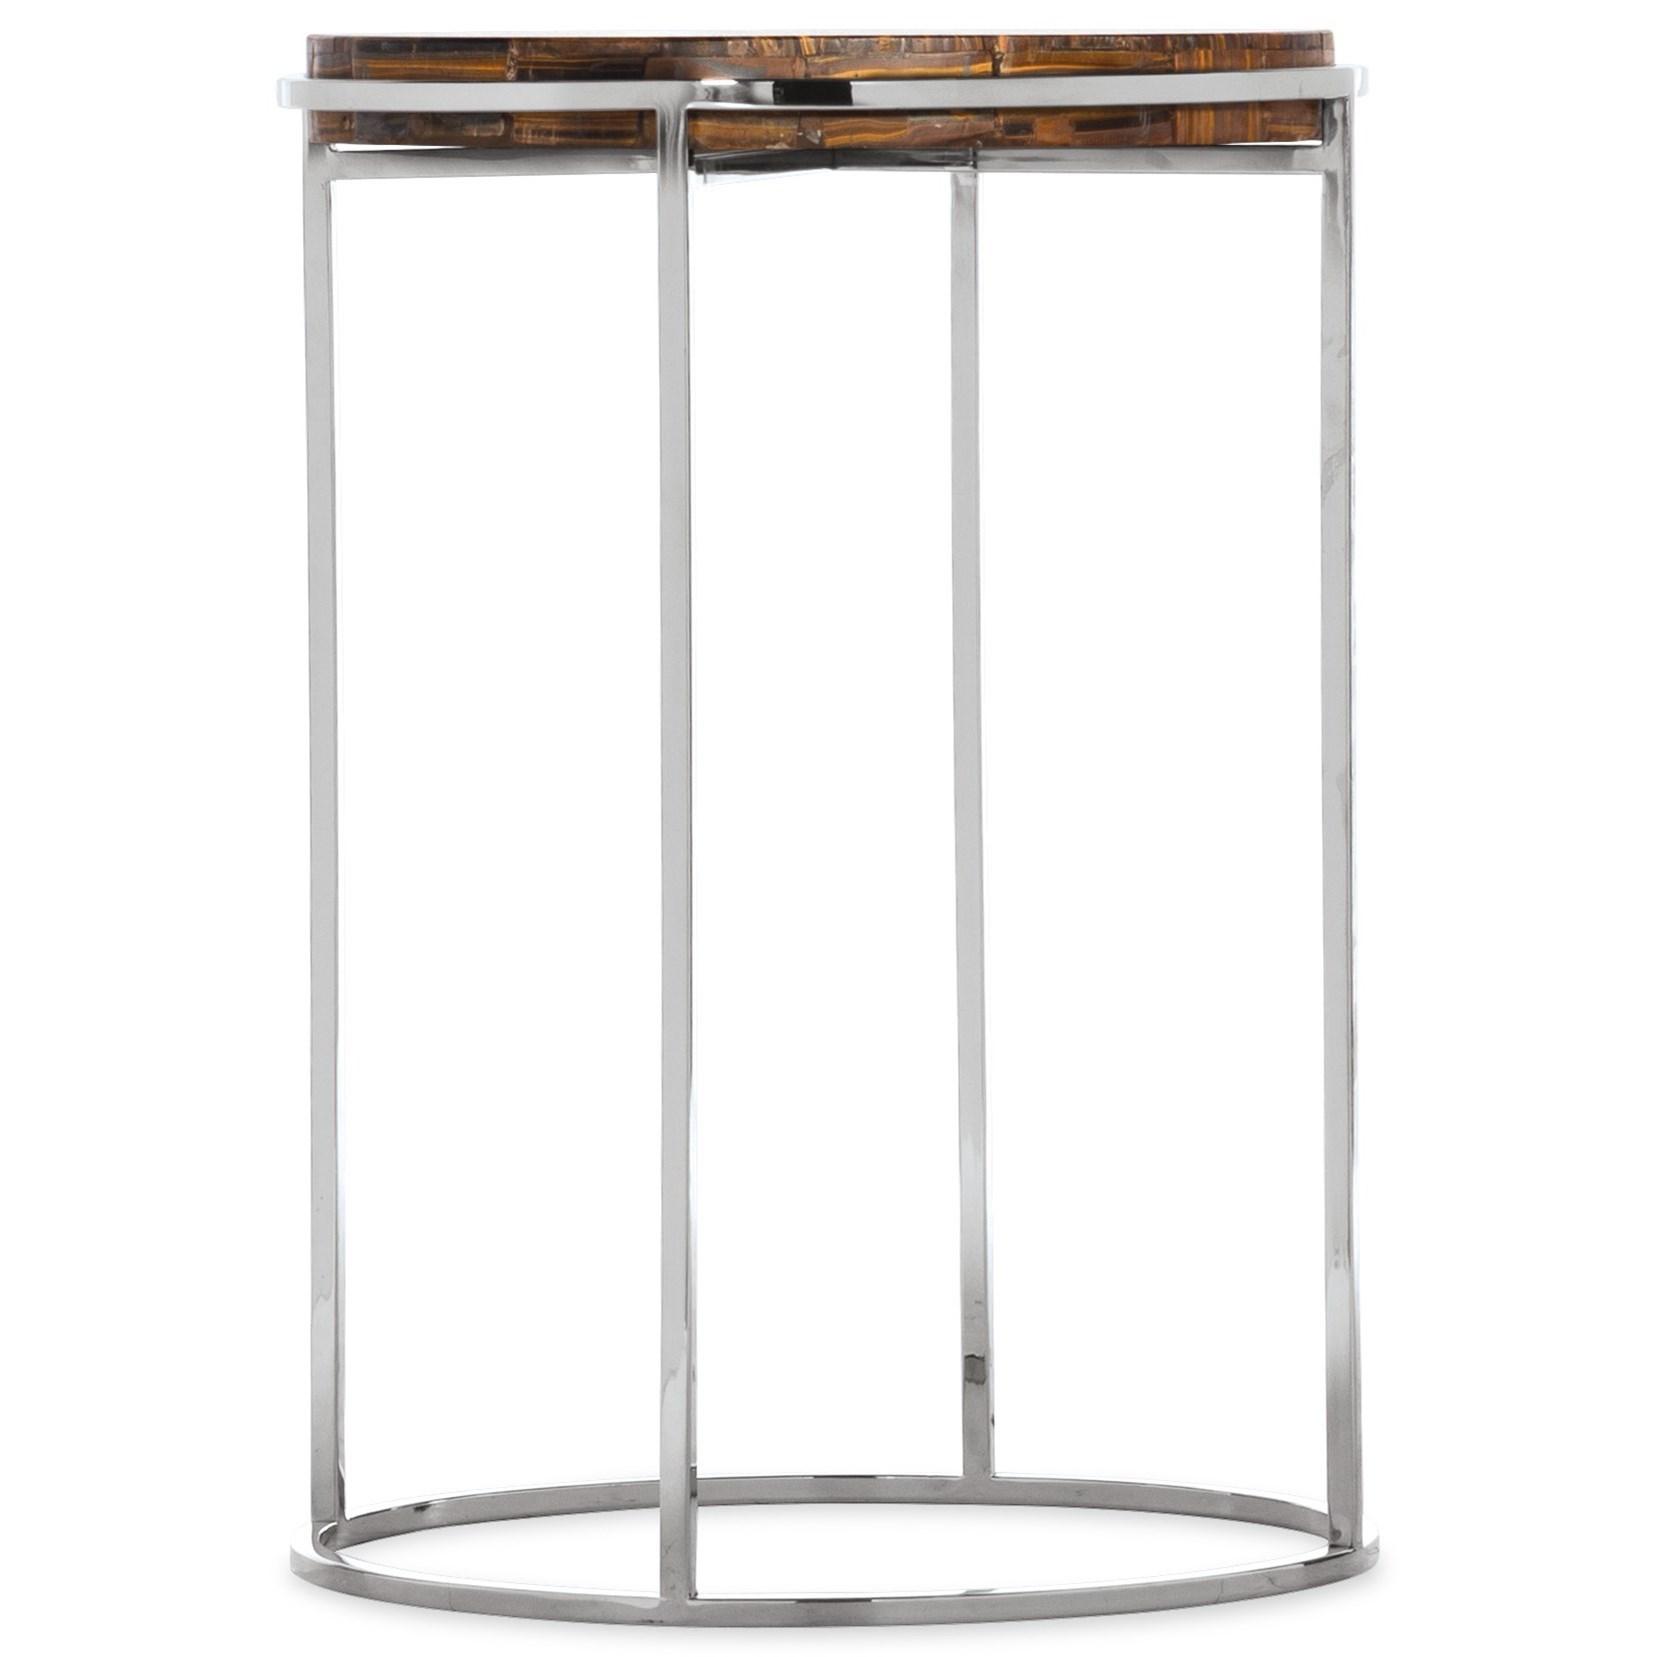 Melange Telsa Accent Table by Hooker Furniture at Suburban Furniture